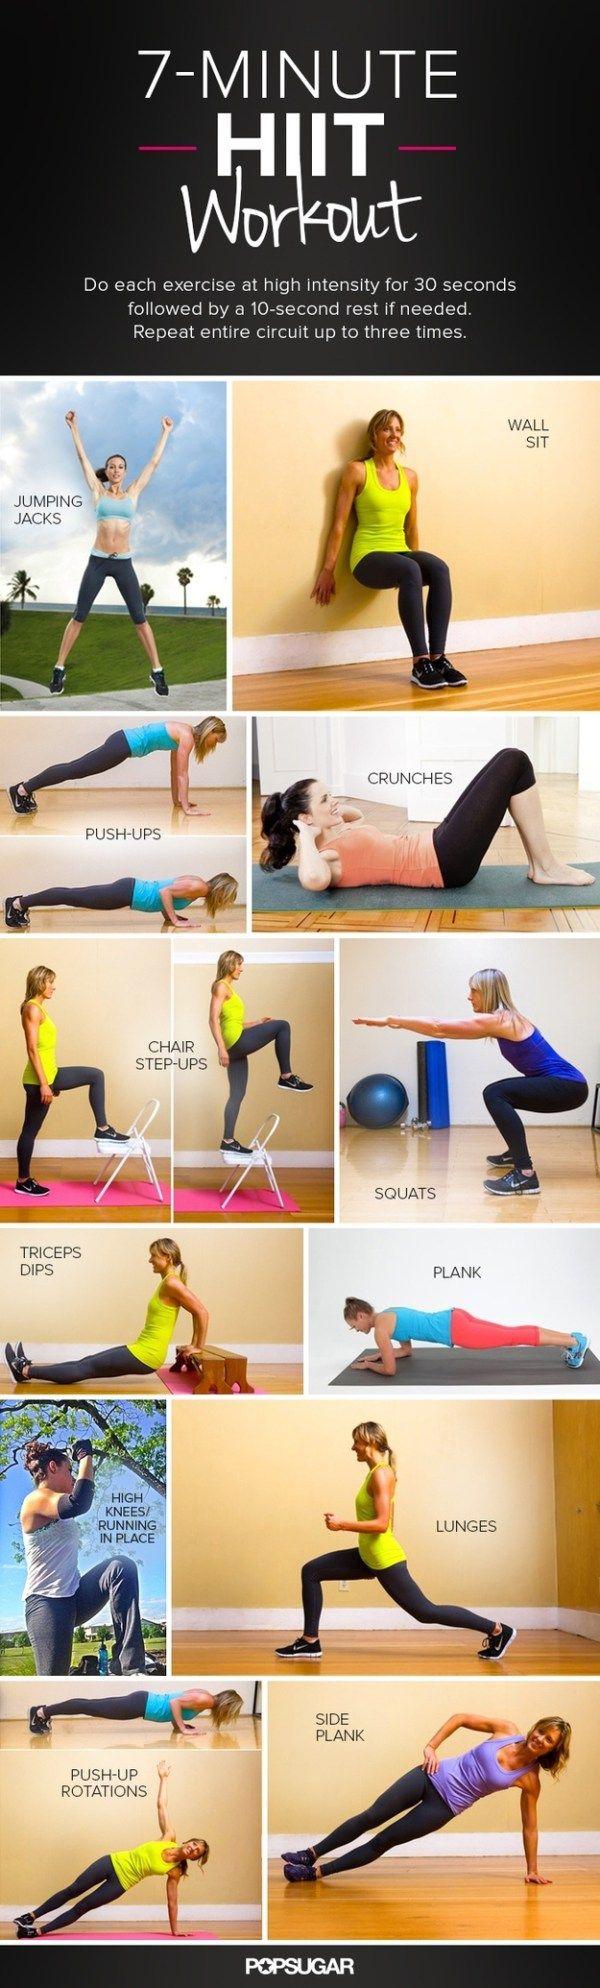 19 Beste Afbeeldingen Van Helpful Hints Gezond Eten Leven 13 Killer Circuit Workouts You Can Do At Home Minqcom 7 For When Youre Feeling Lazy